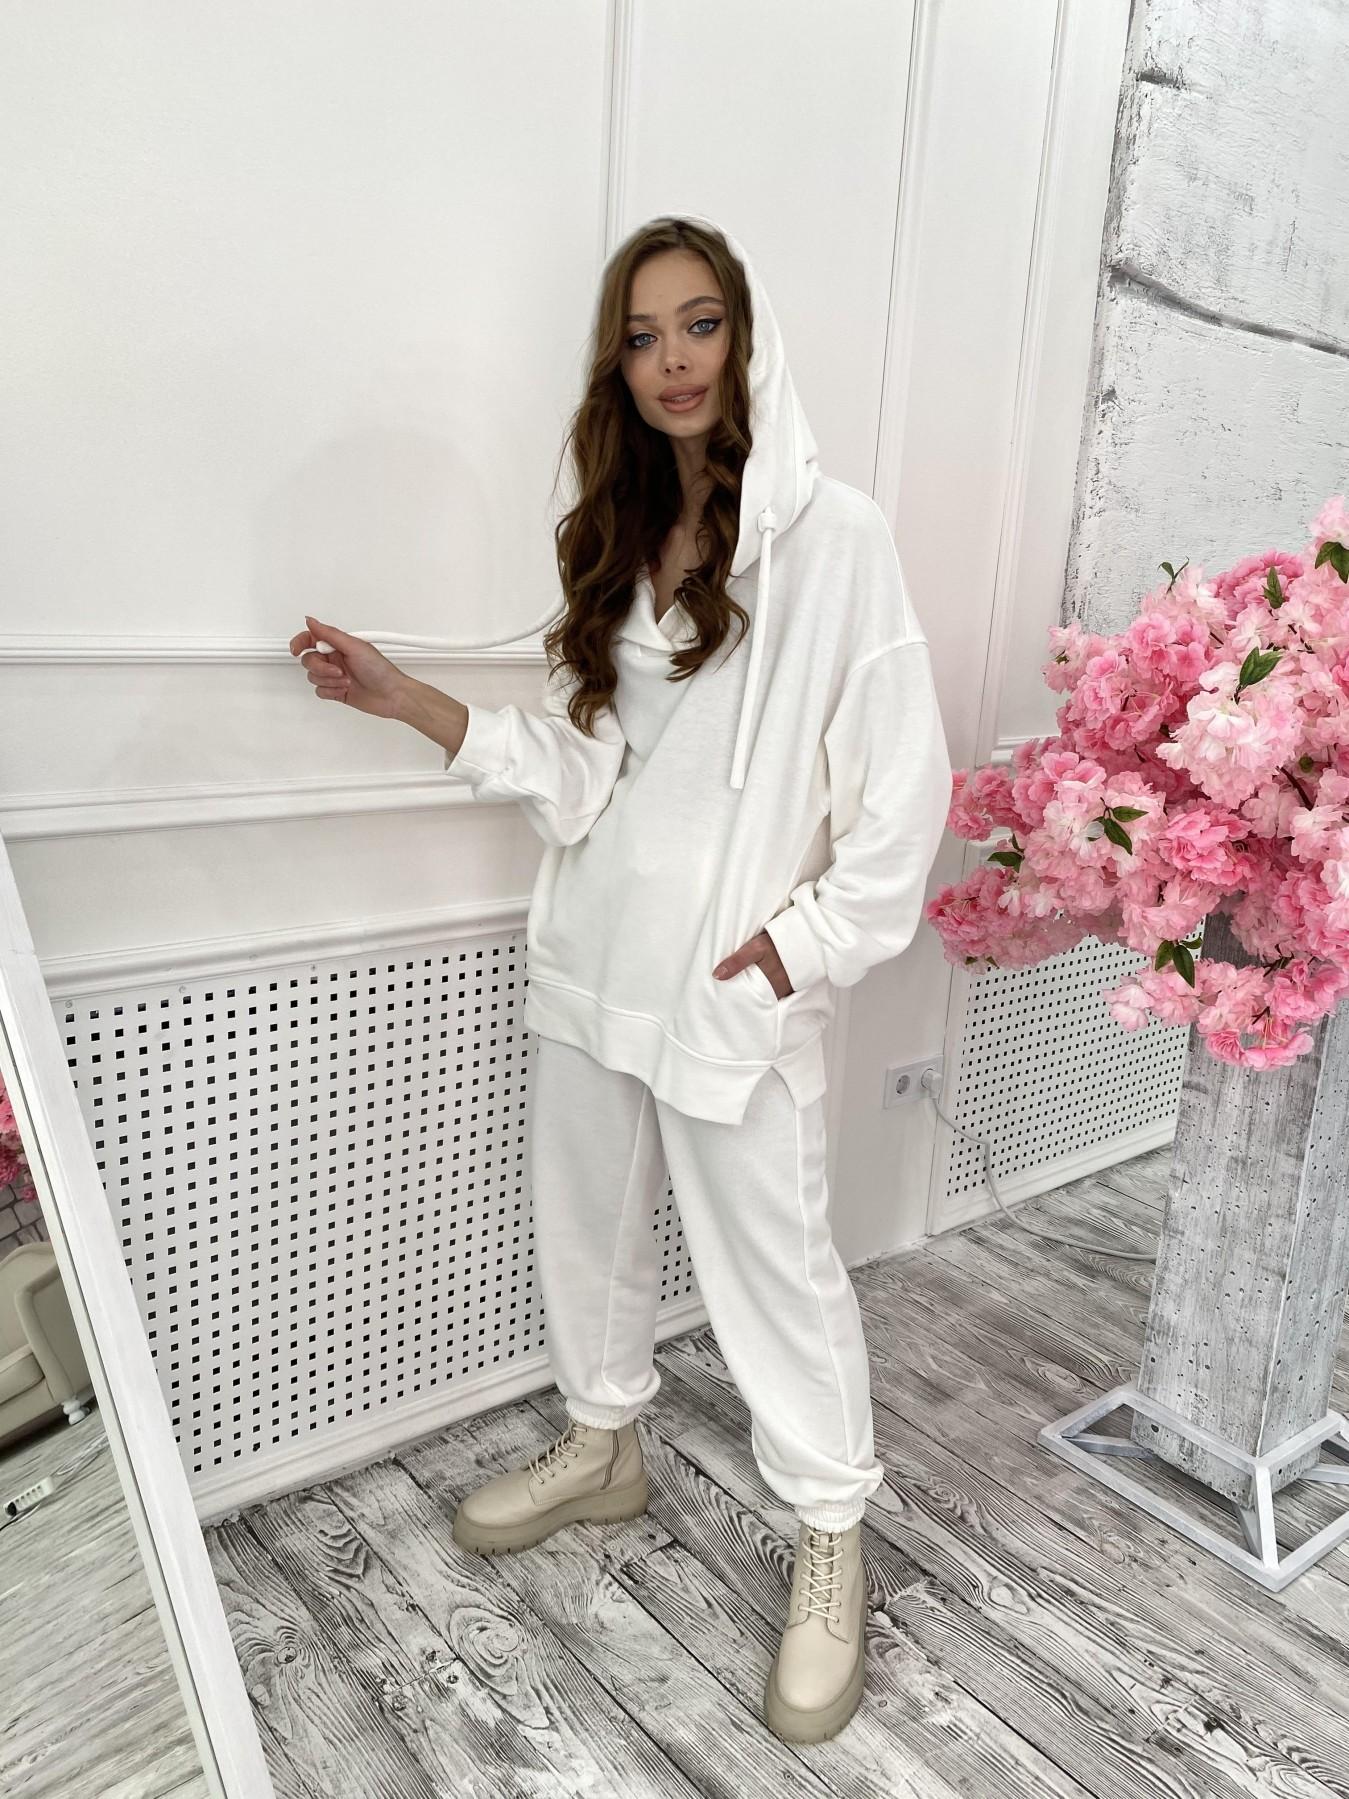 Ярис костюм из 3х нитки 10789 АРТ. 47267 Цвет: Молоко - фото 3, интернет магазин tm-modus.ru